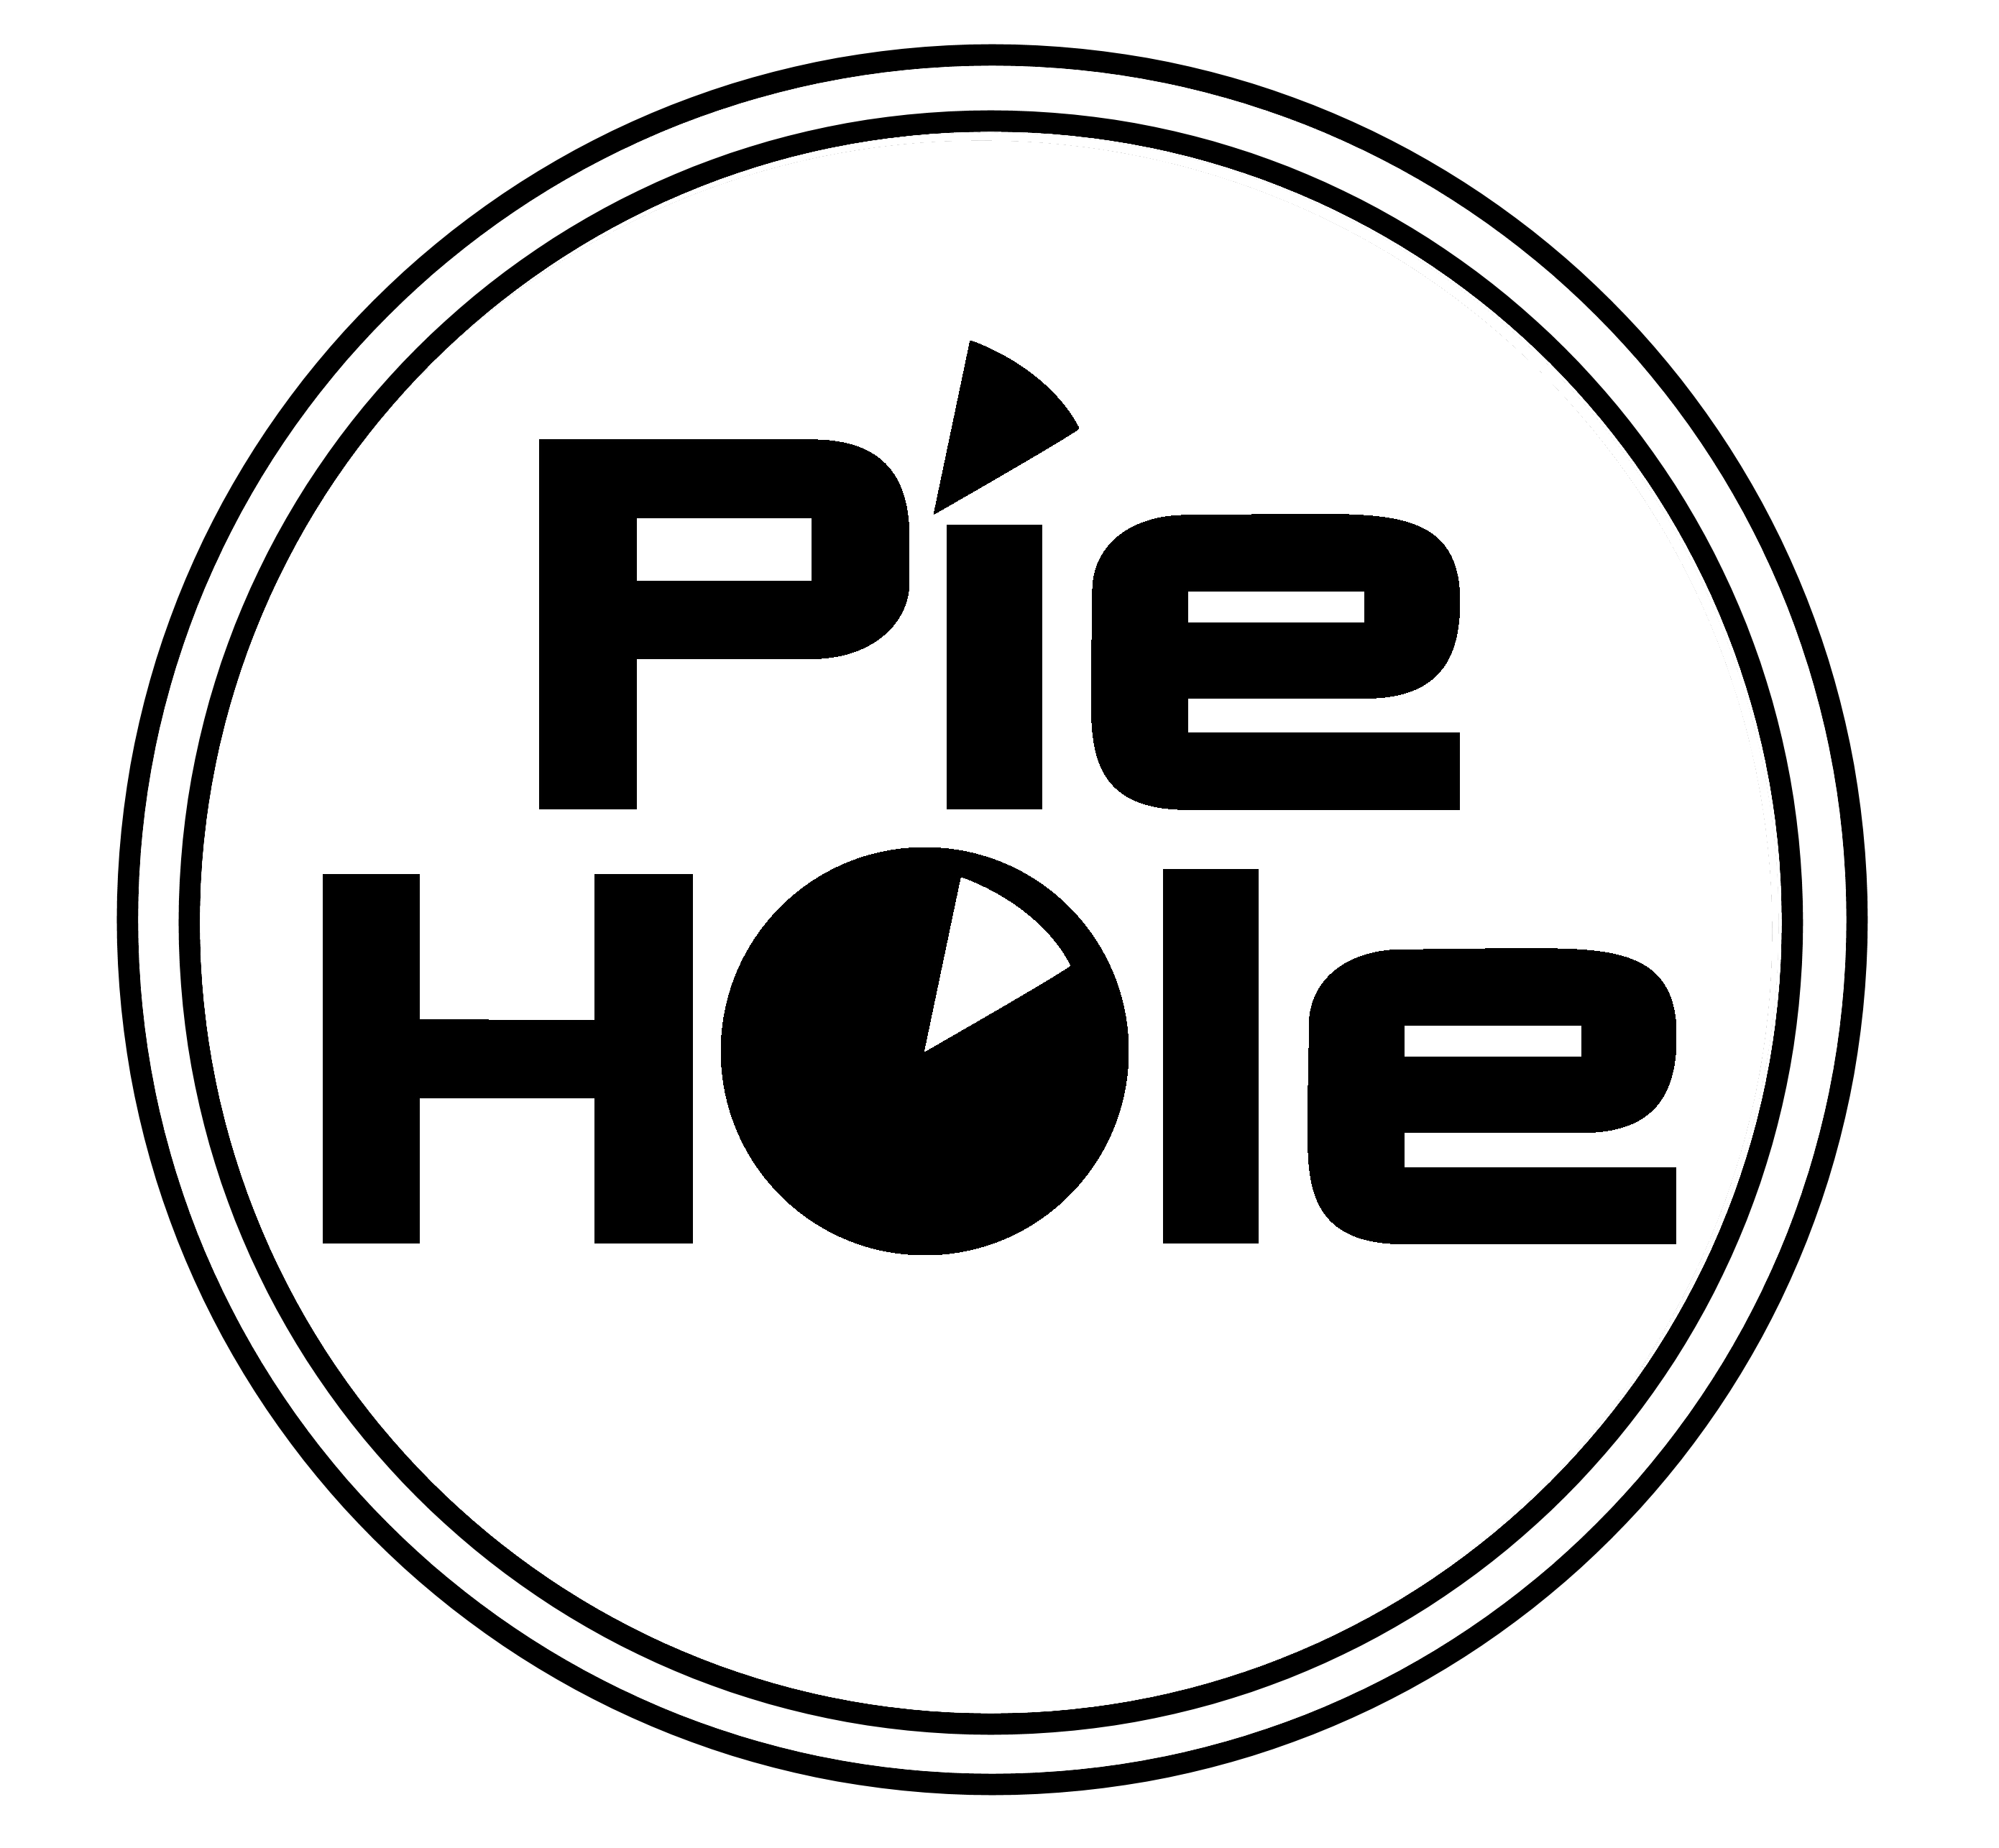 piehole circle logo